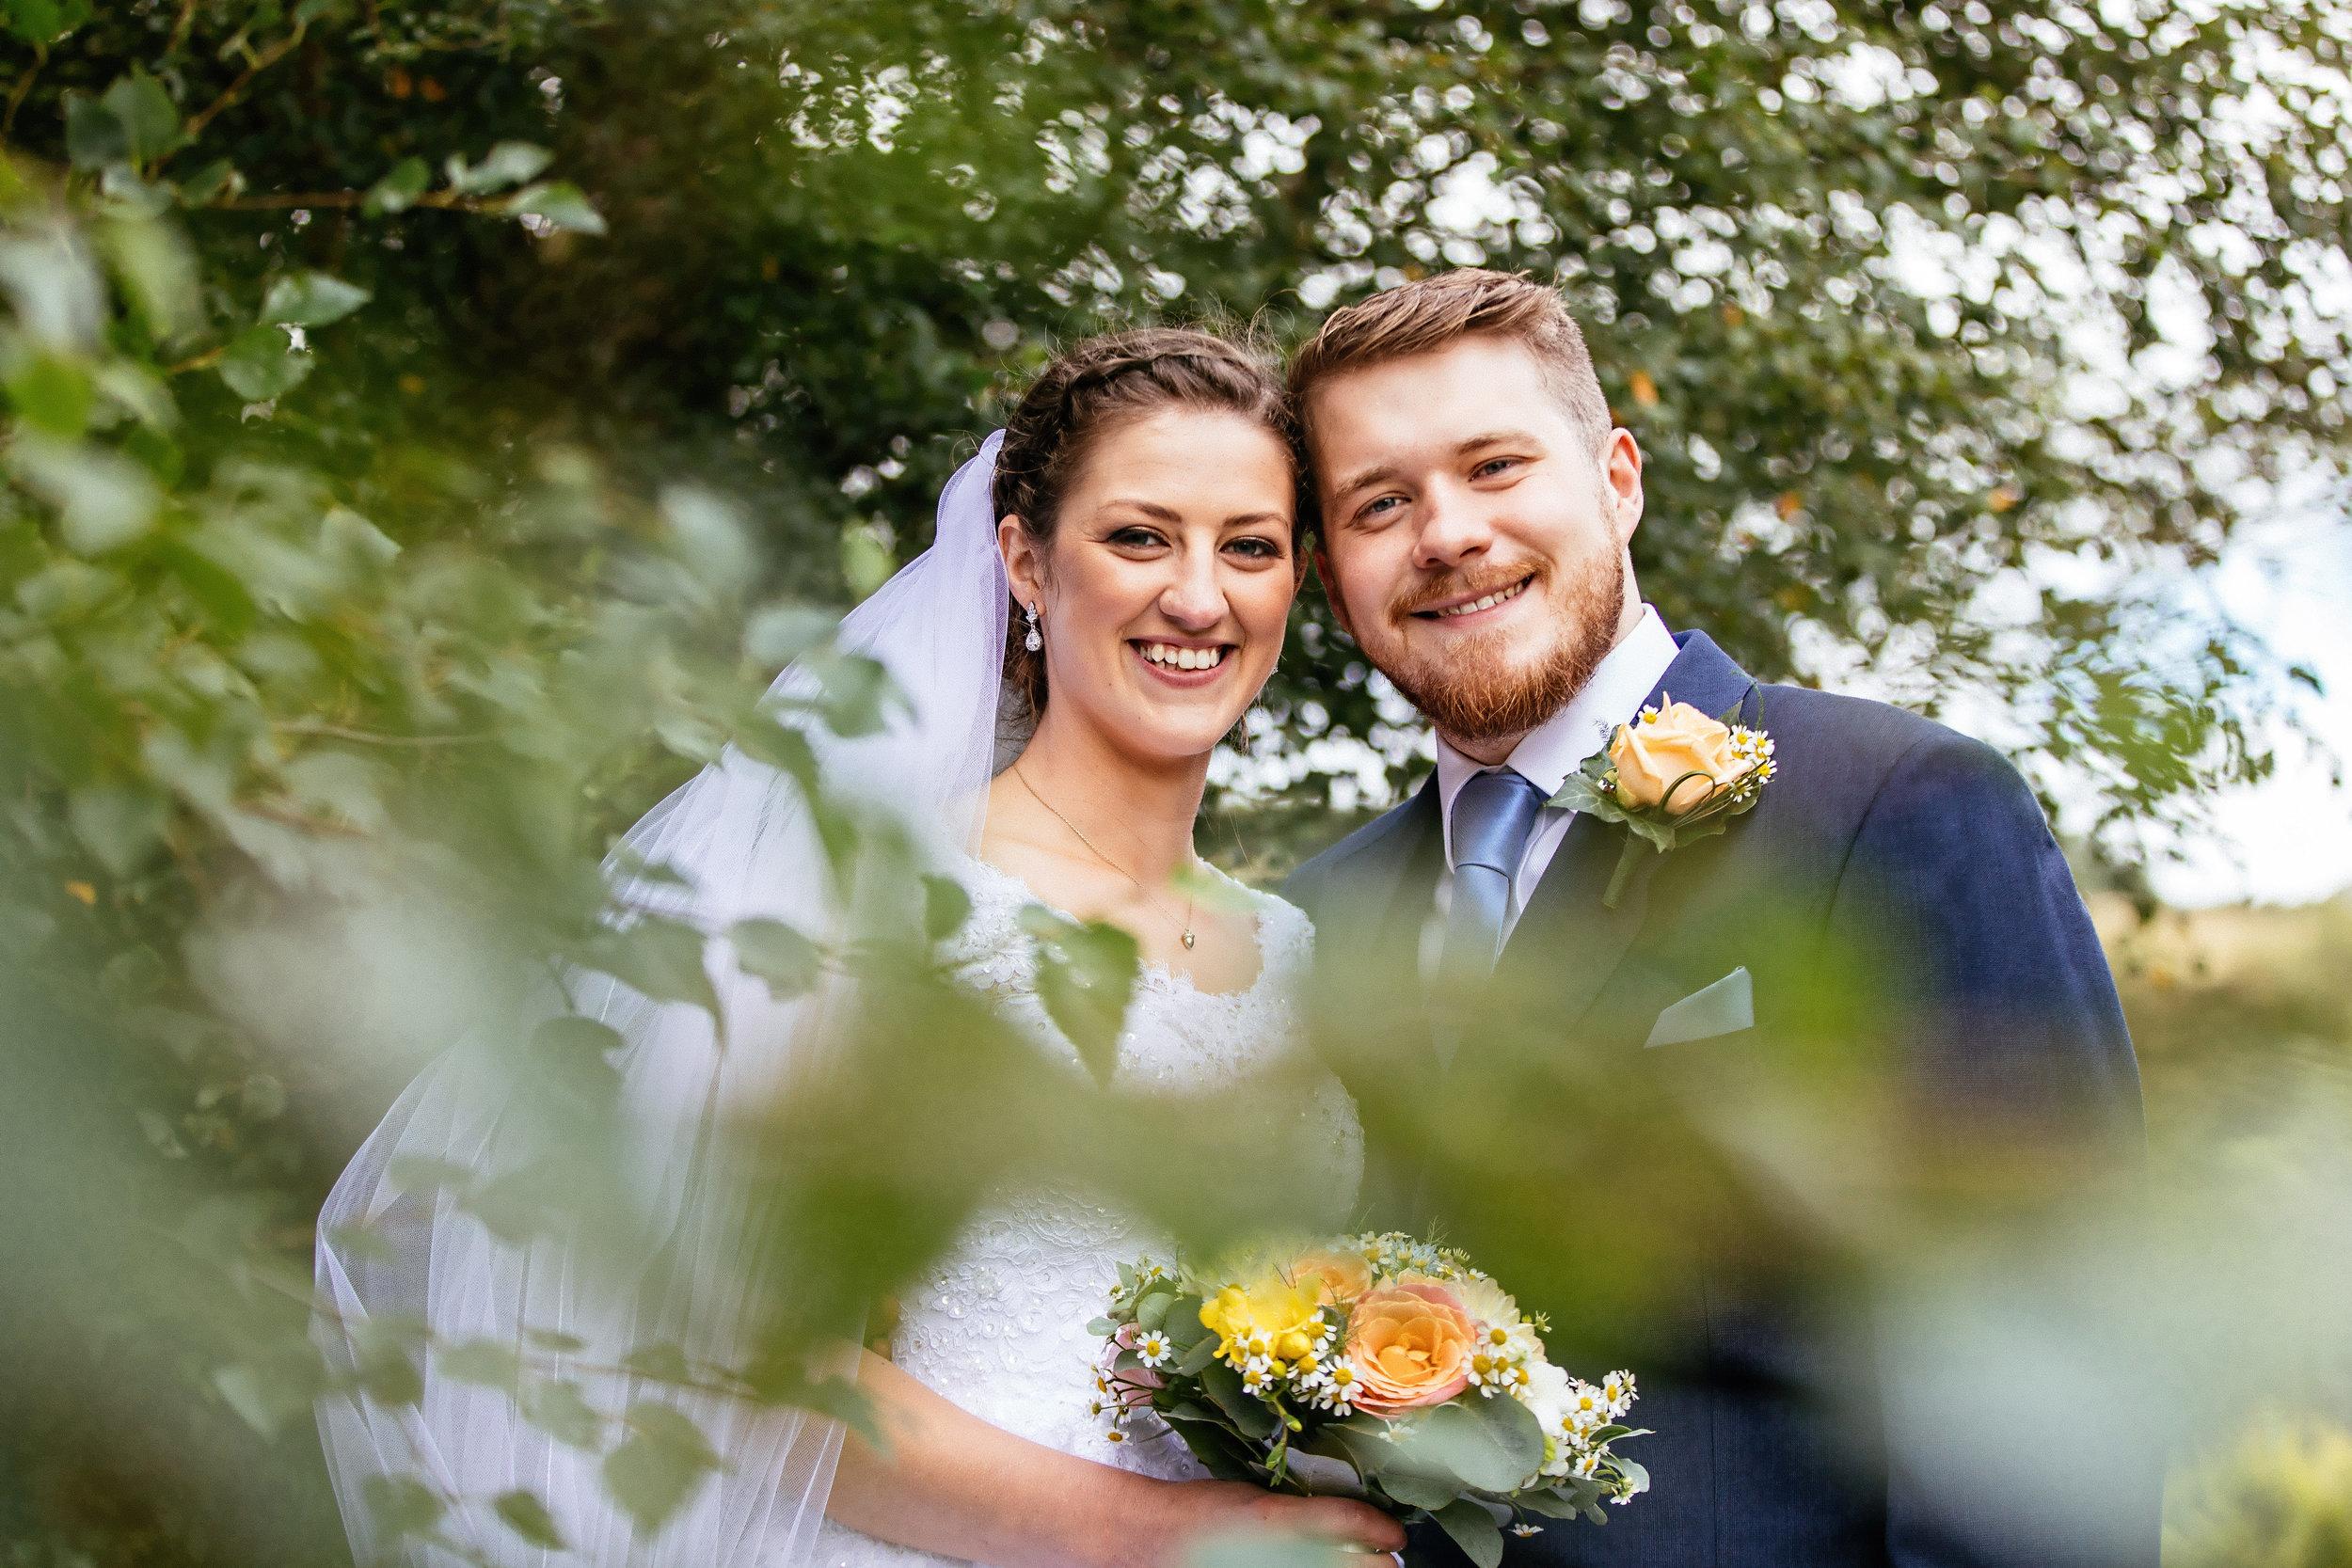 Kathryn-and-Mike-Wedding-Highlights-64.jpg